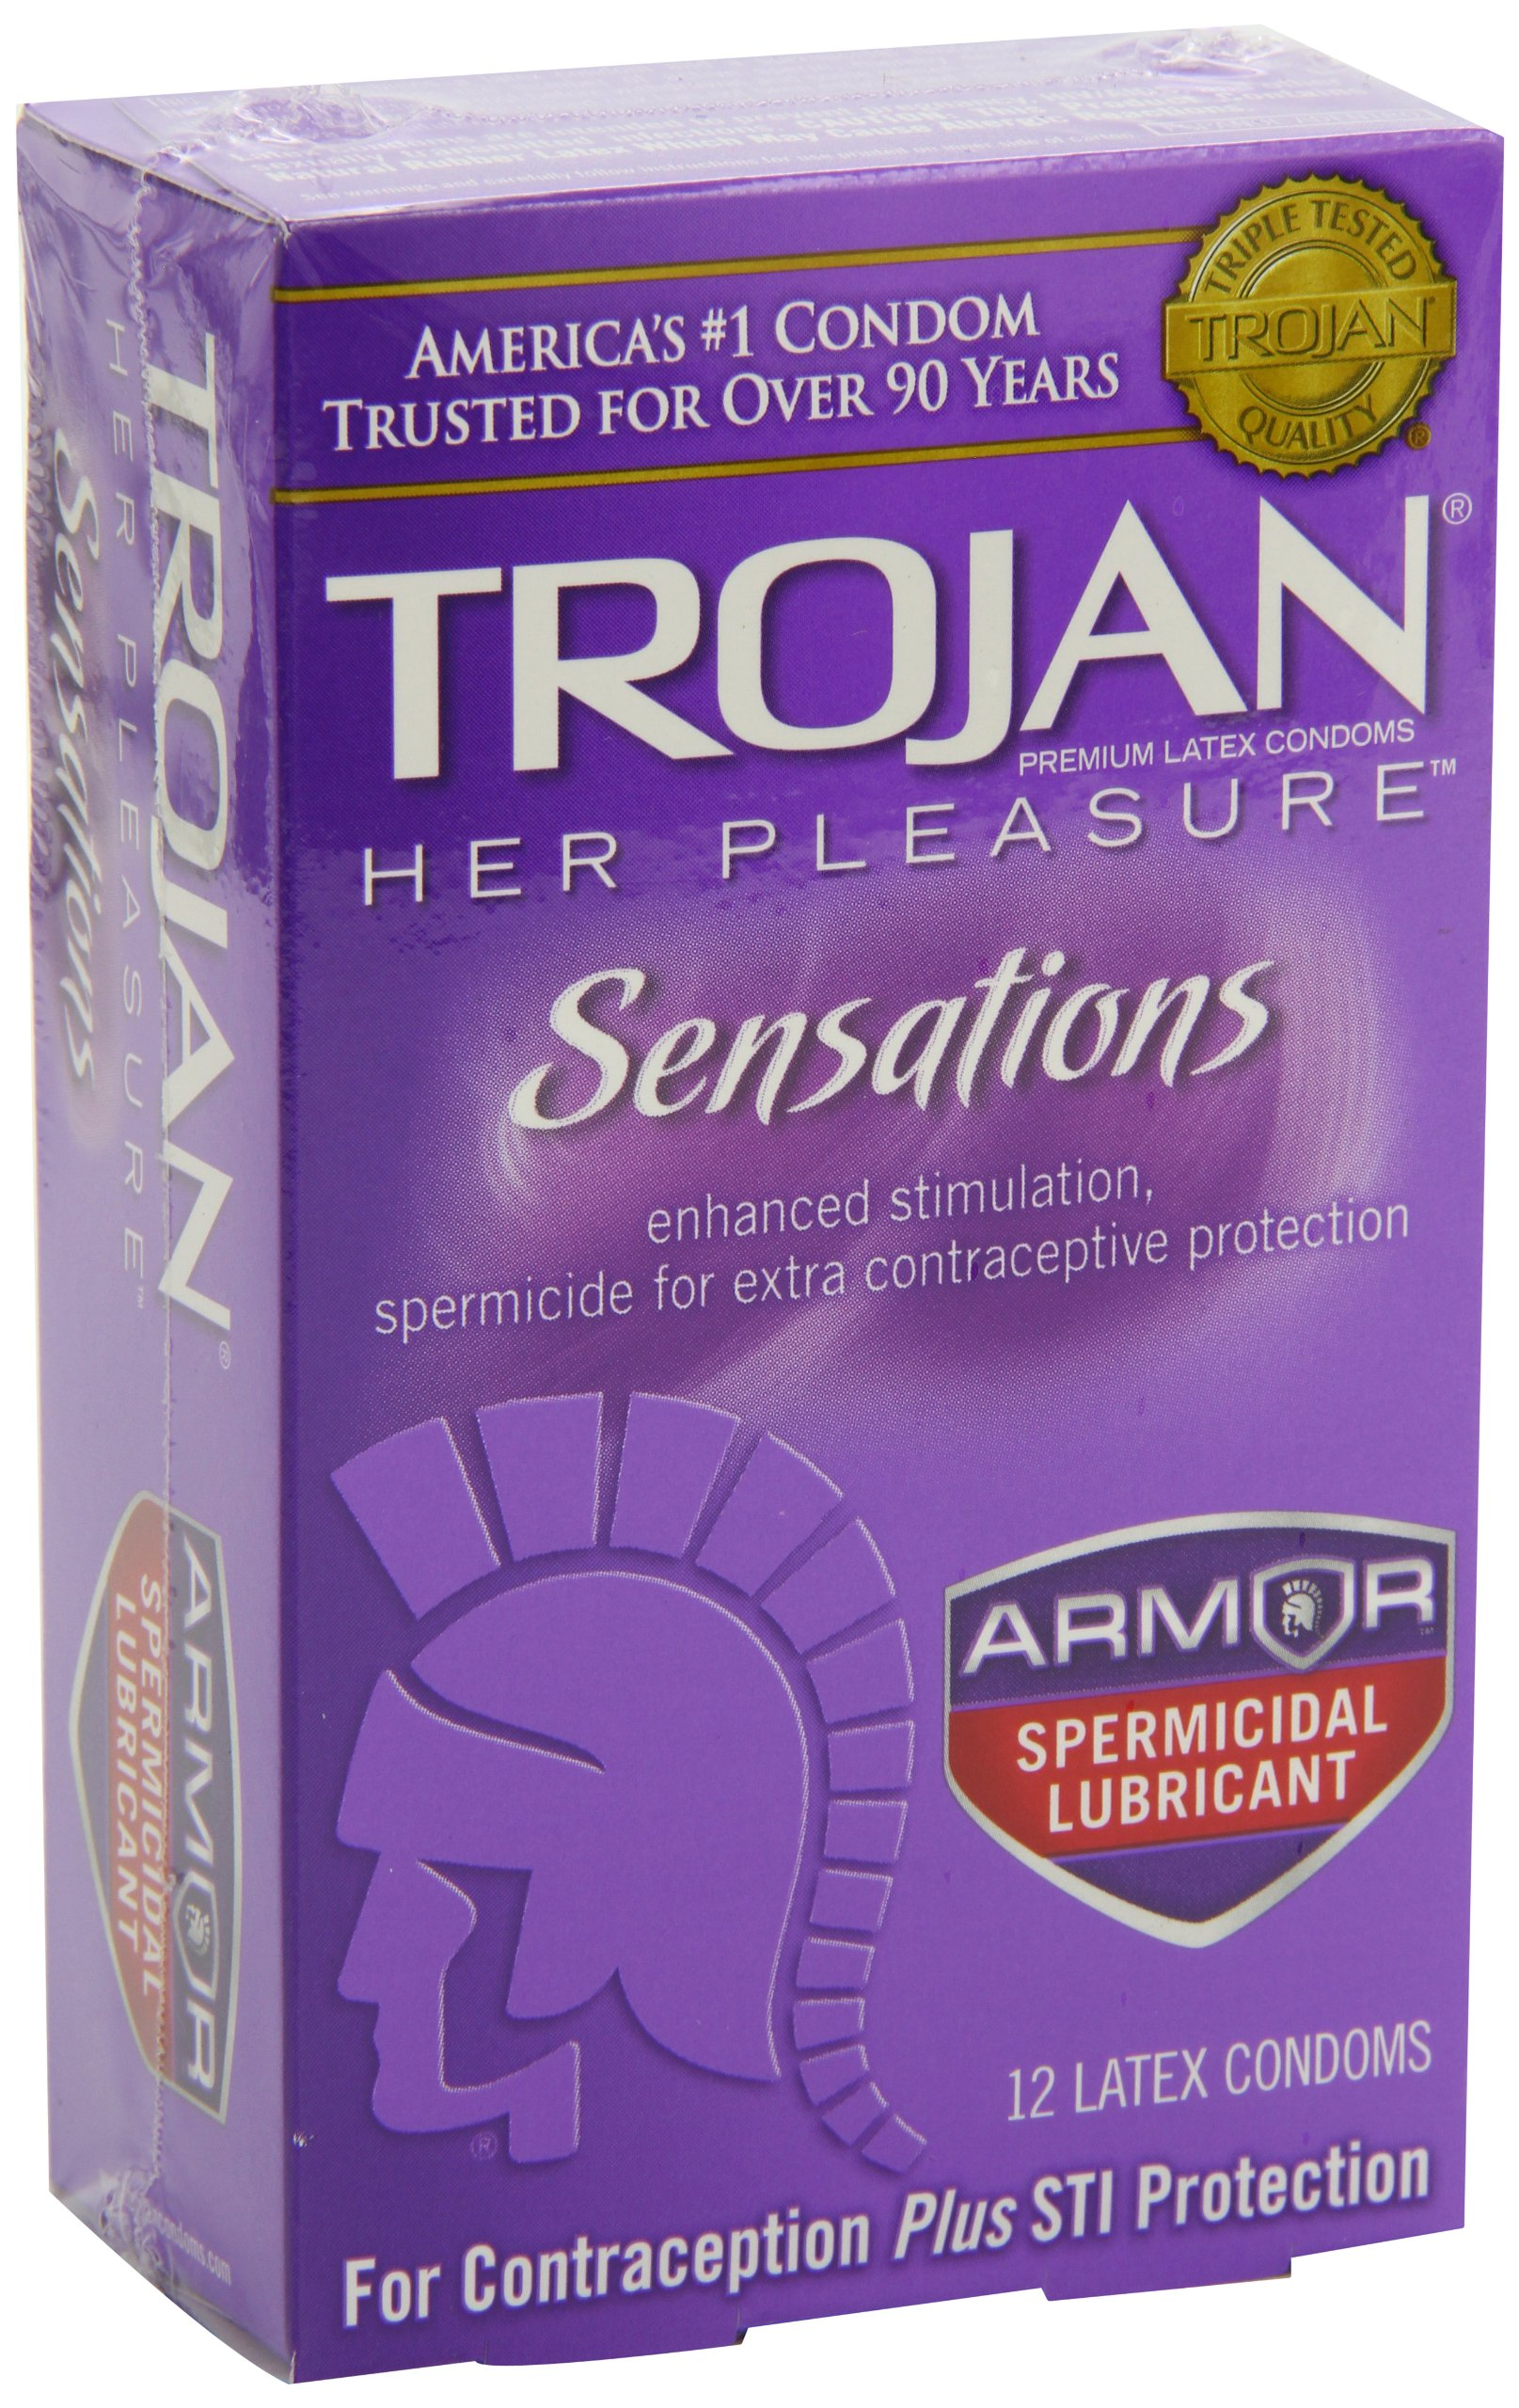 Trojan Her Pleasure Sensations Spermicidal Condoms, 12 Count